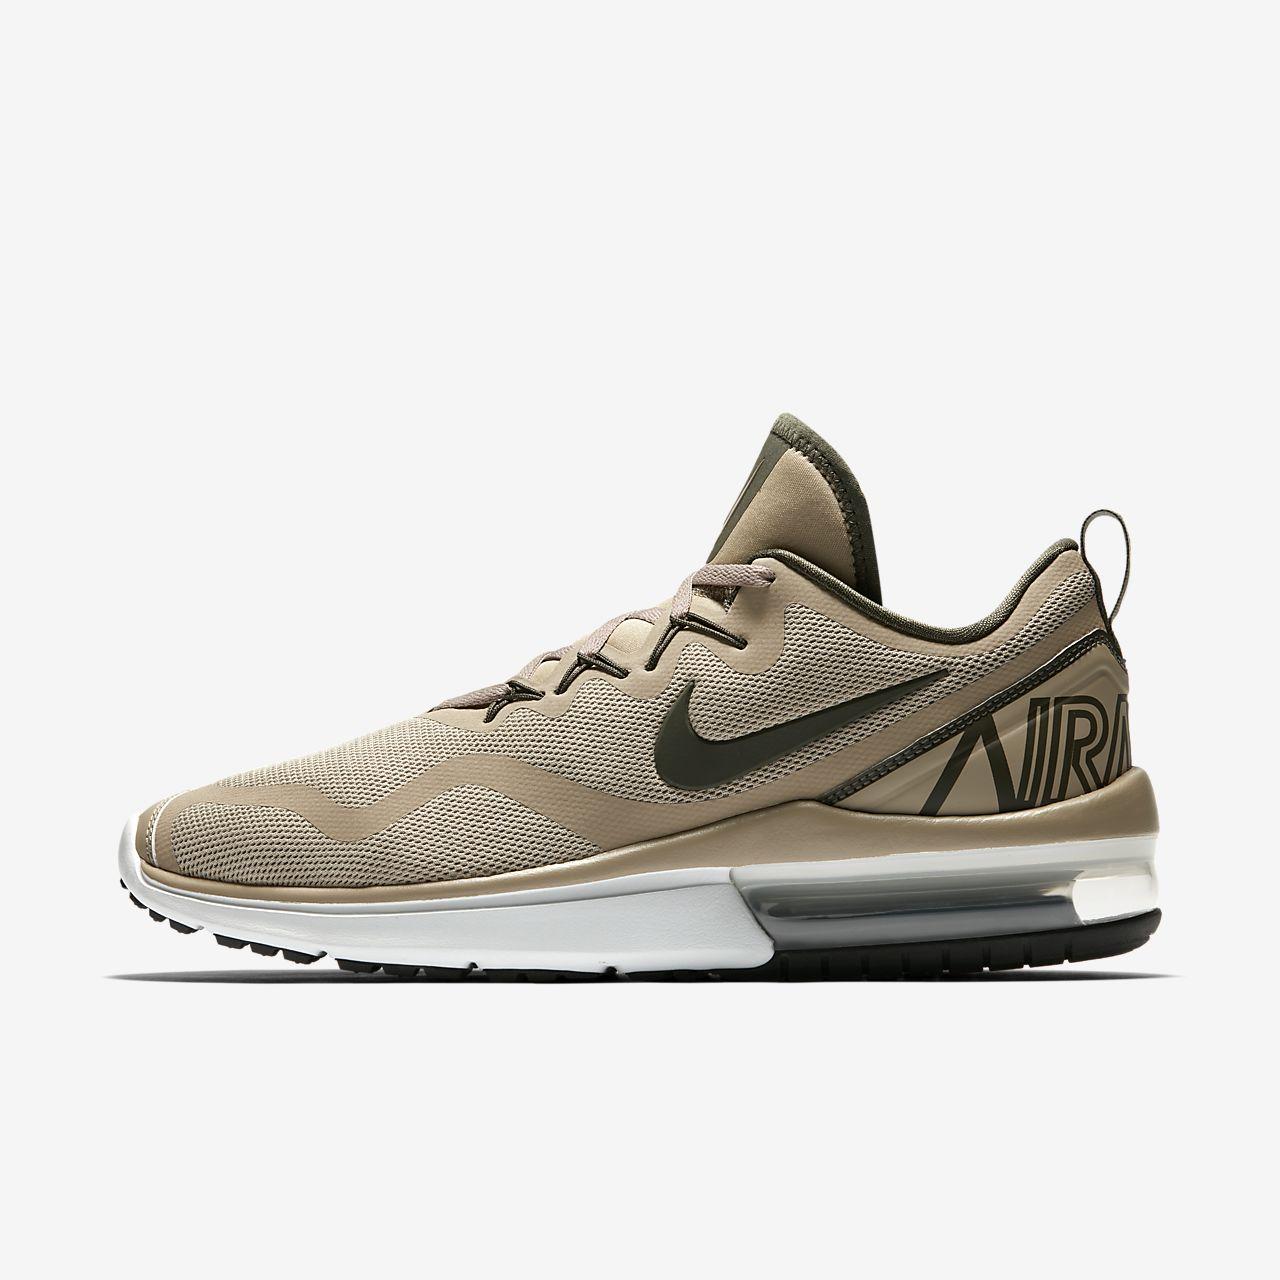 best service 0634b f7b24 Nike Air Max Fury Erkek Koşu Ayakkabısı